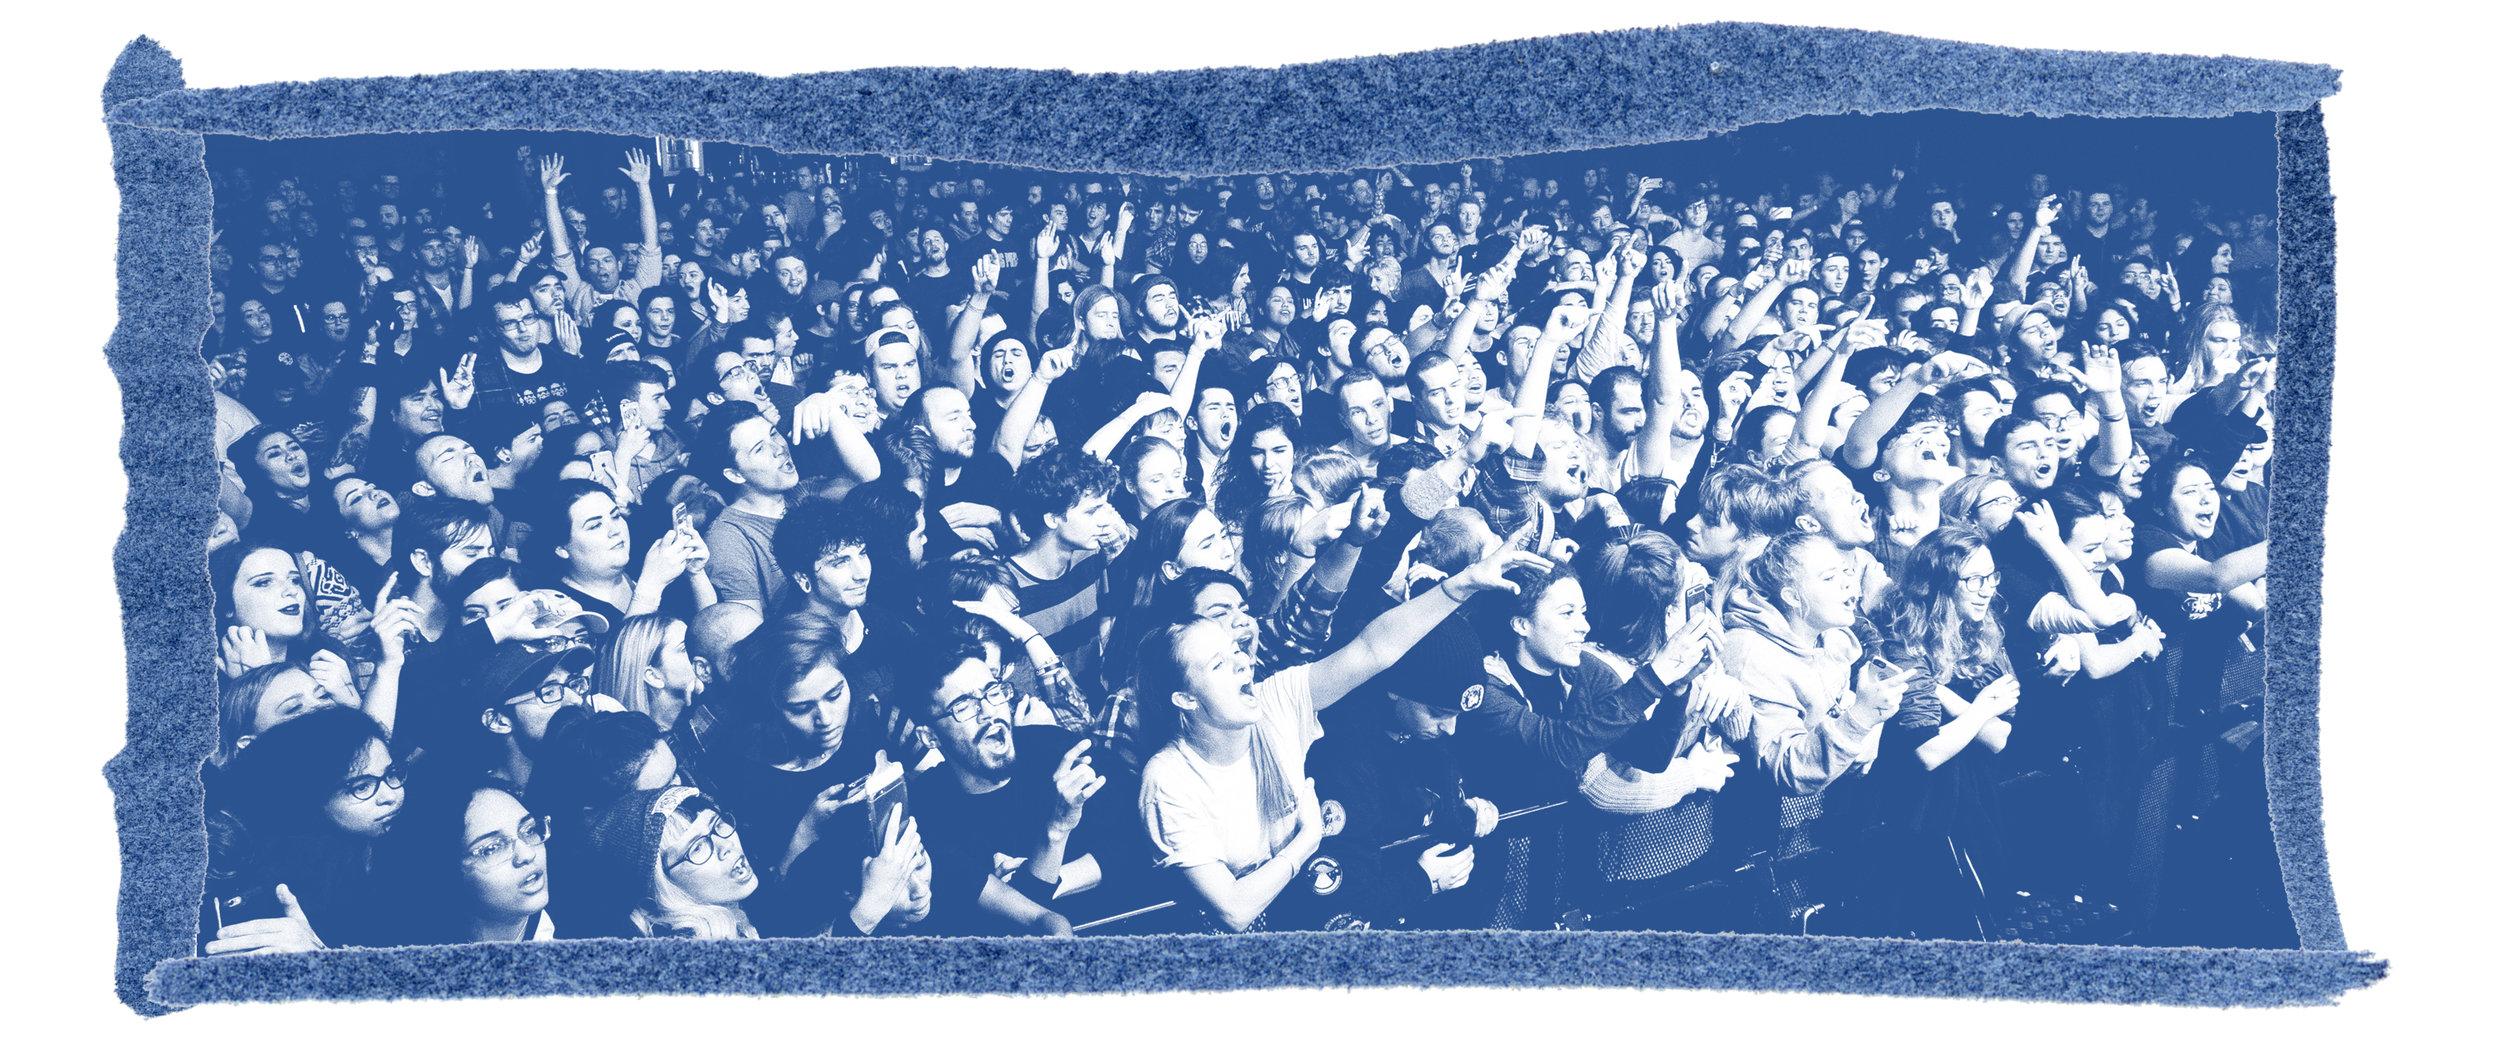 crowd-texture.jpg